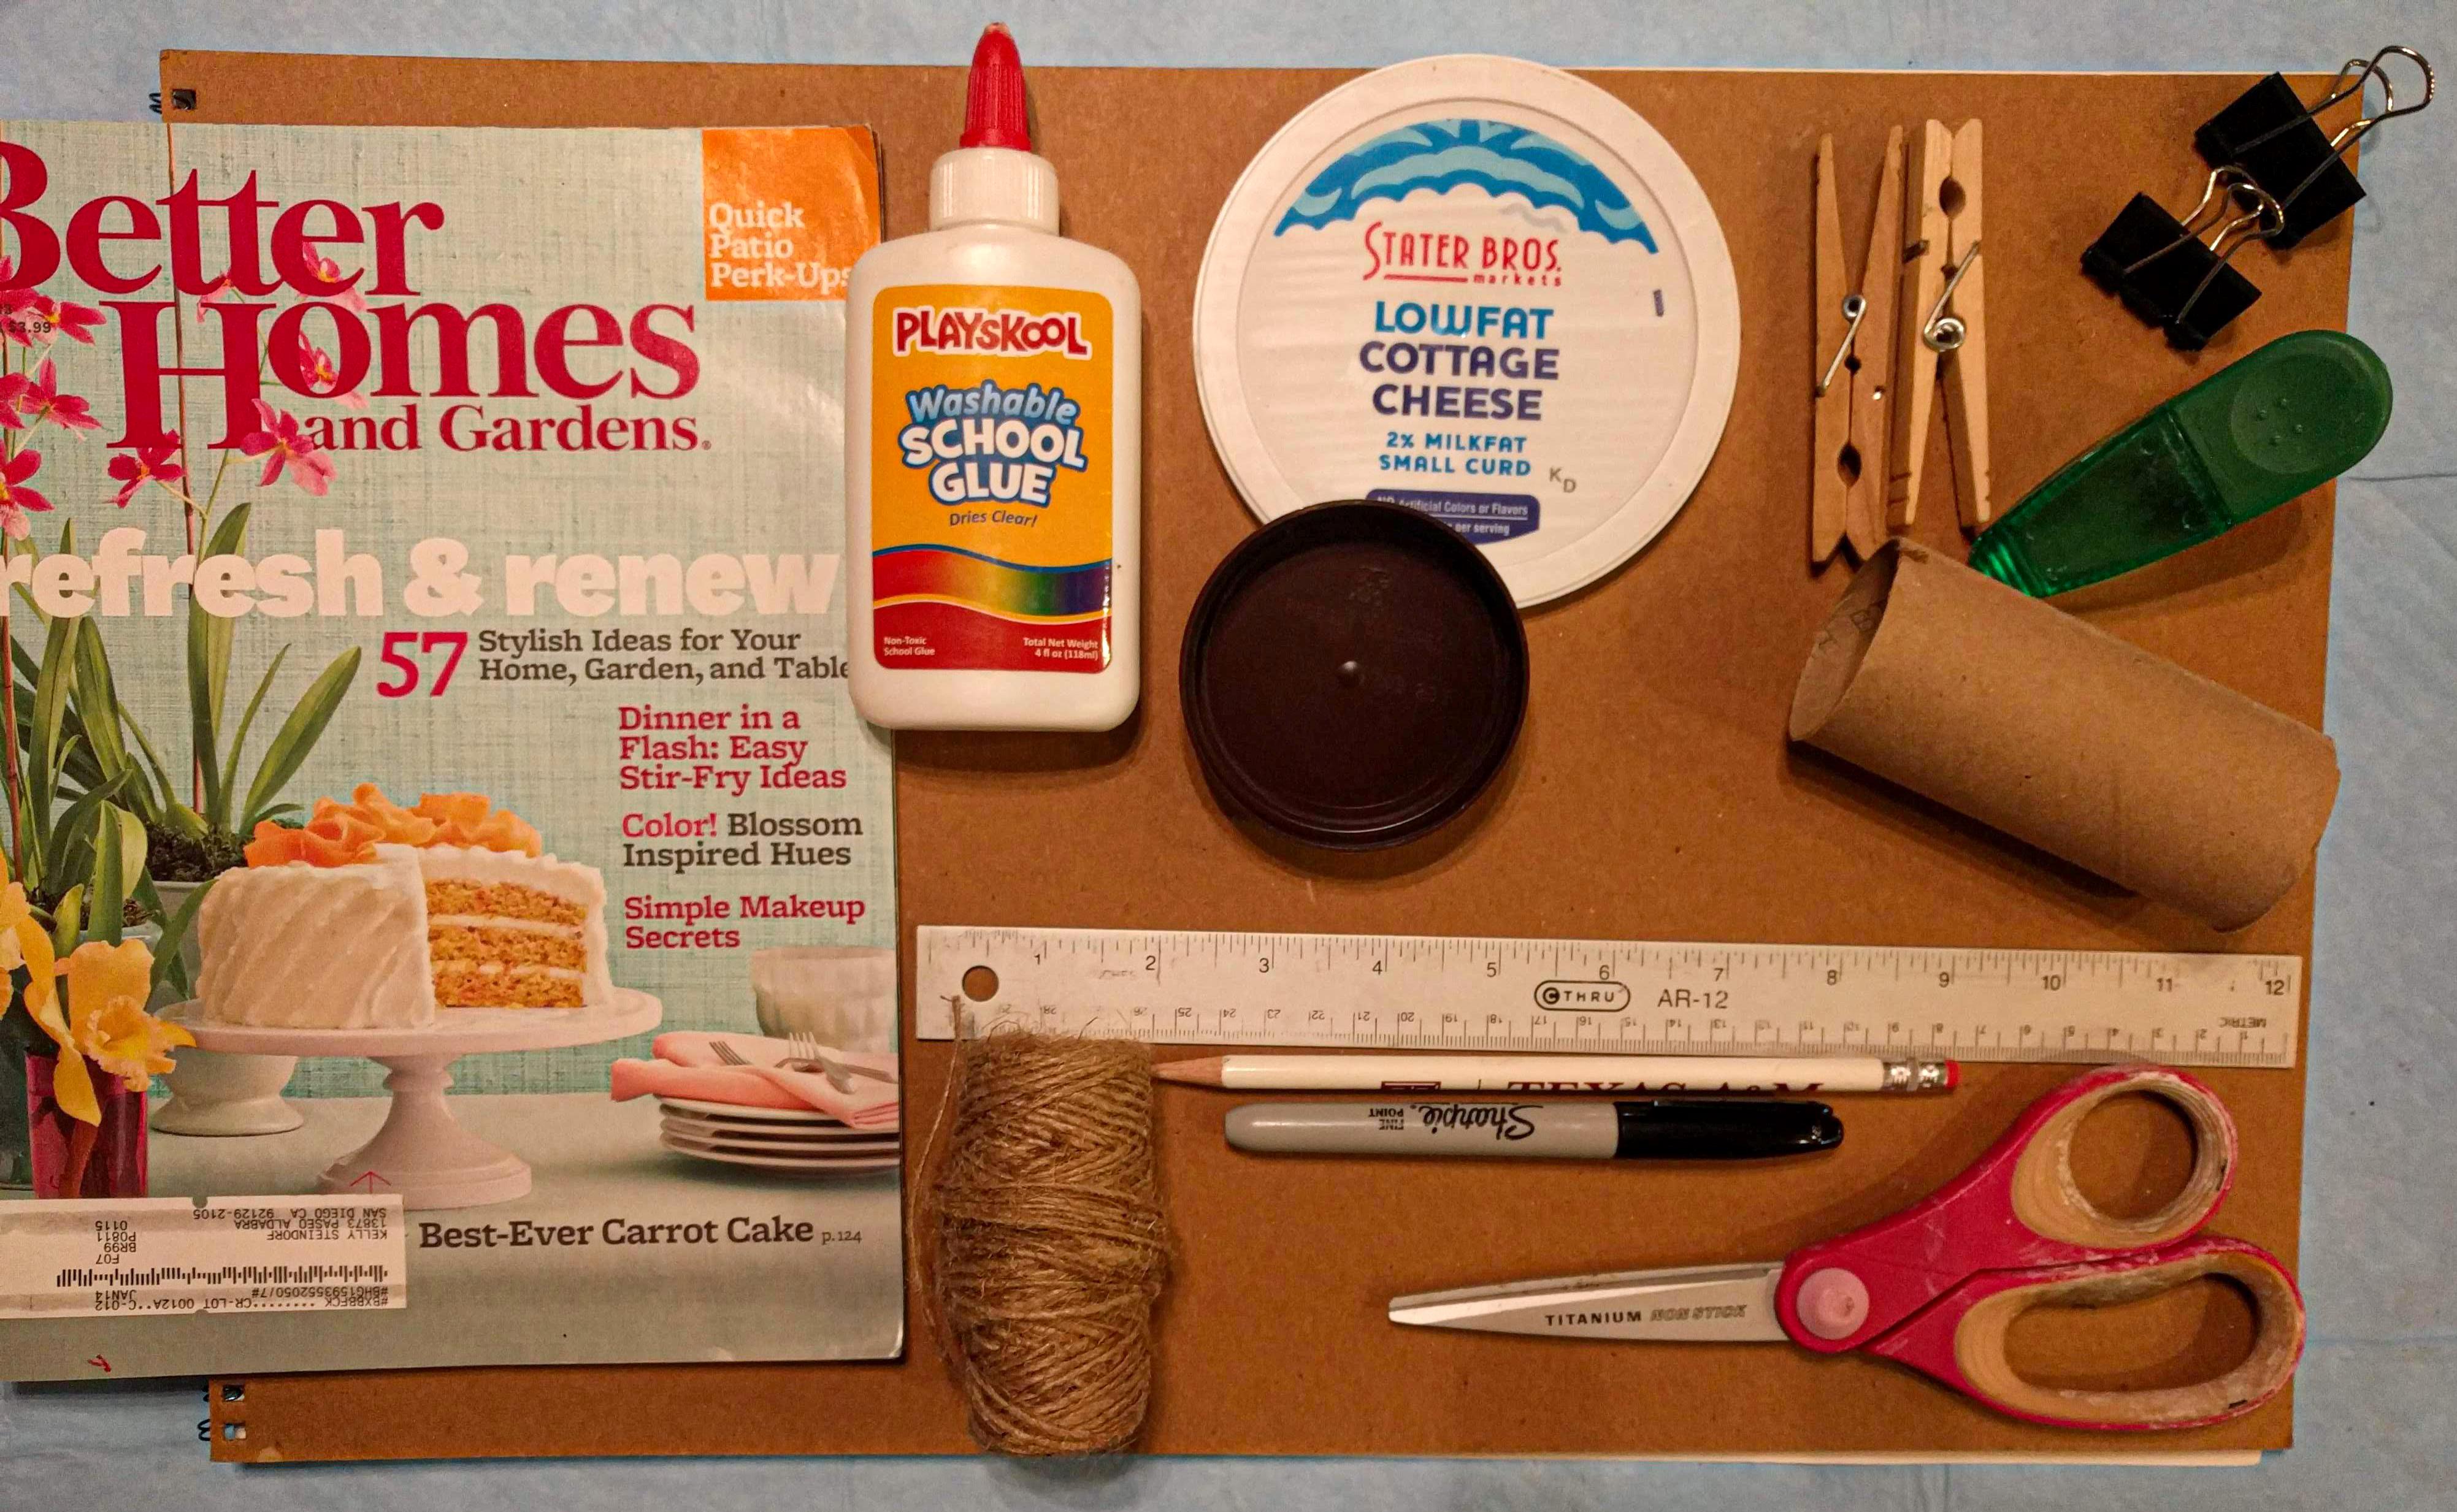 Supplies - Glue, Ruler, Scissors, magazines, lids